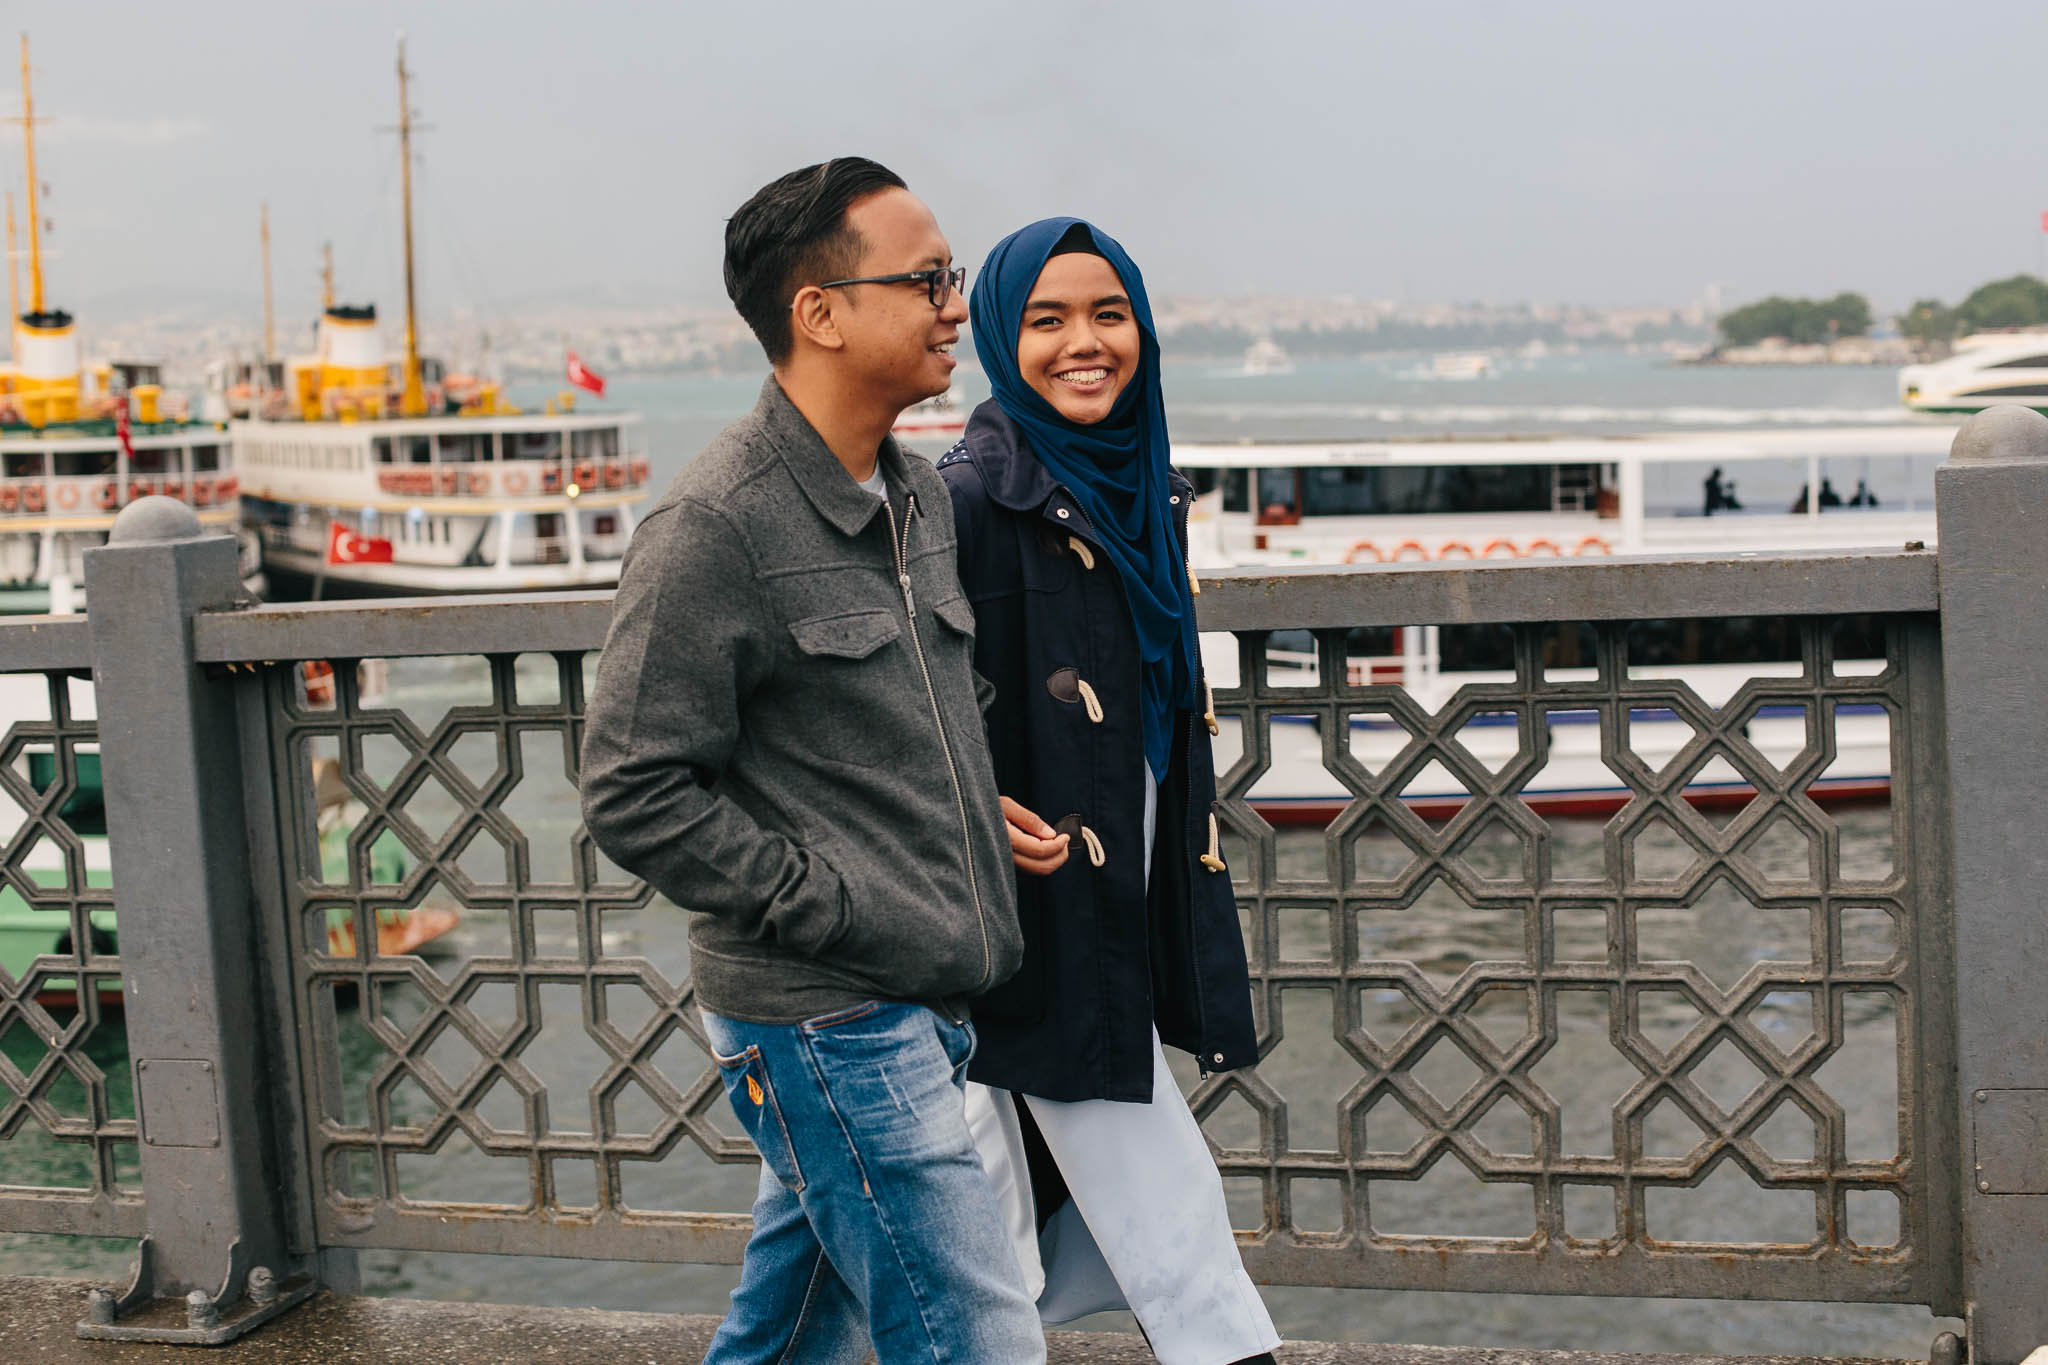 singapore-wedding-photographer-dzul-isma-istanbul-wmt-48.jpg